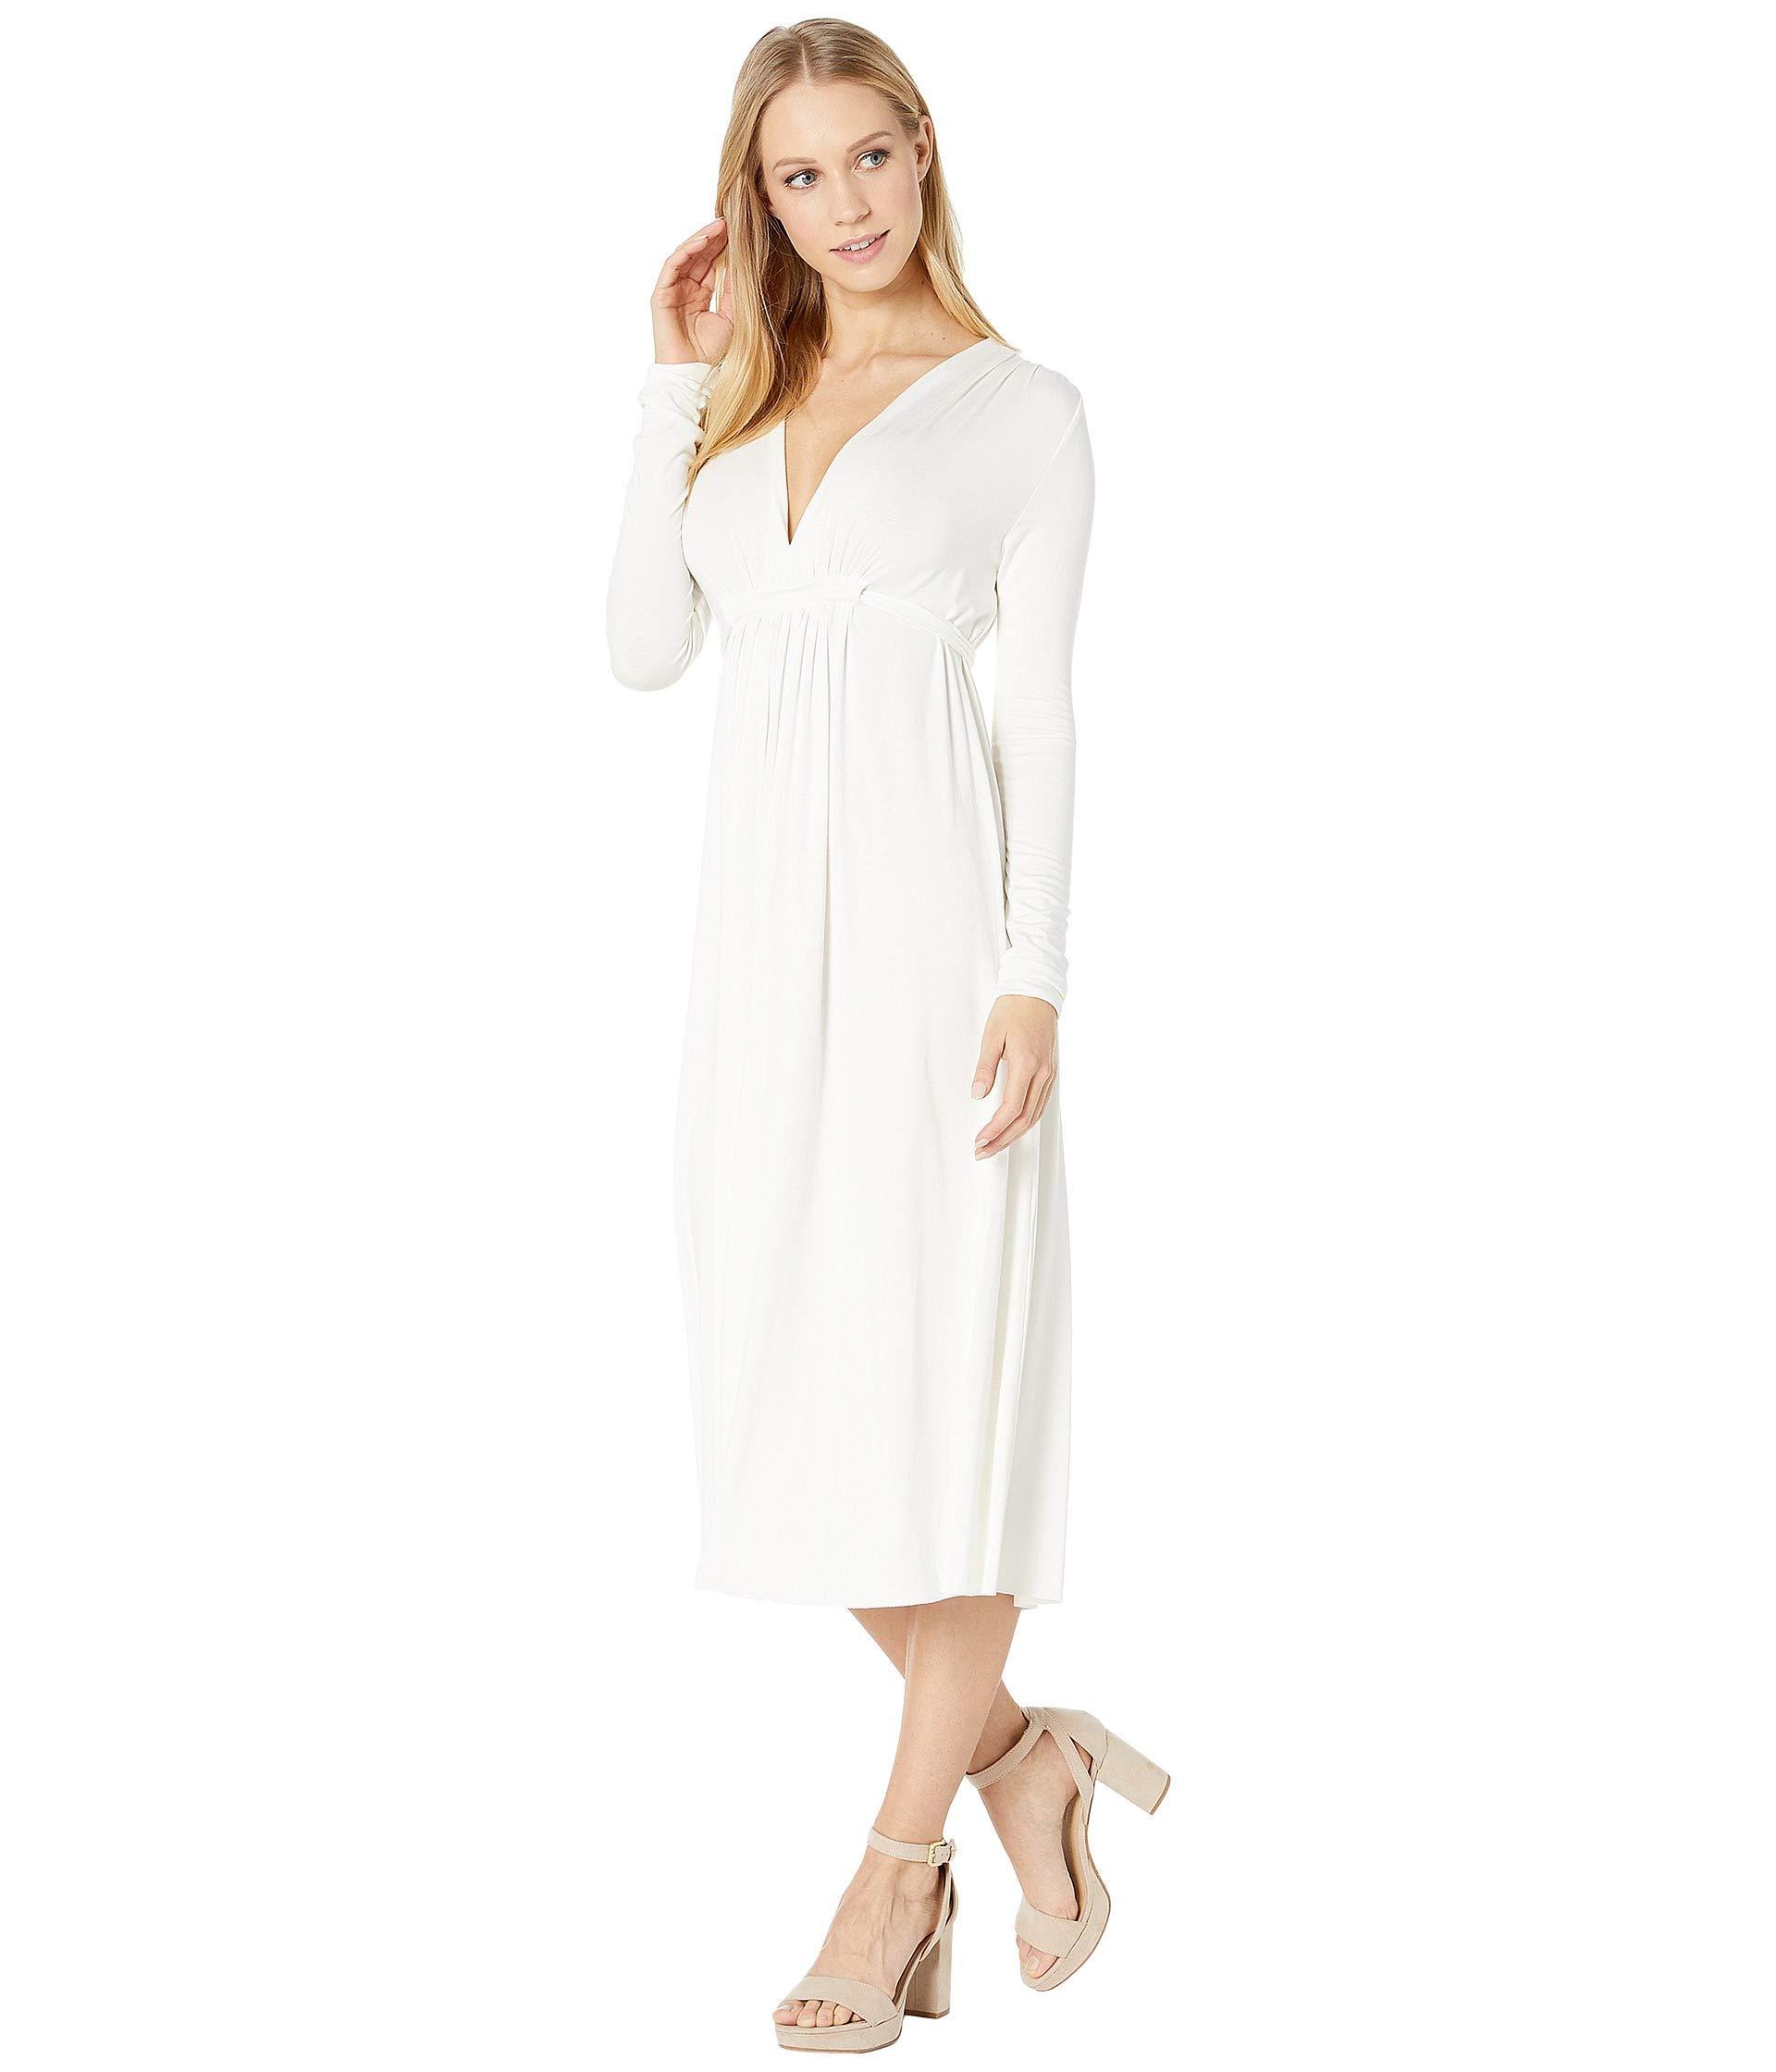 1a9a60f5796 Lyst - Rachel Pally Long Sleeve Midi Caftan (black) Women's Clothing in  White